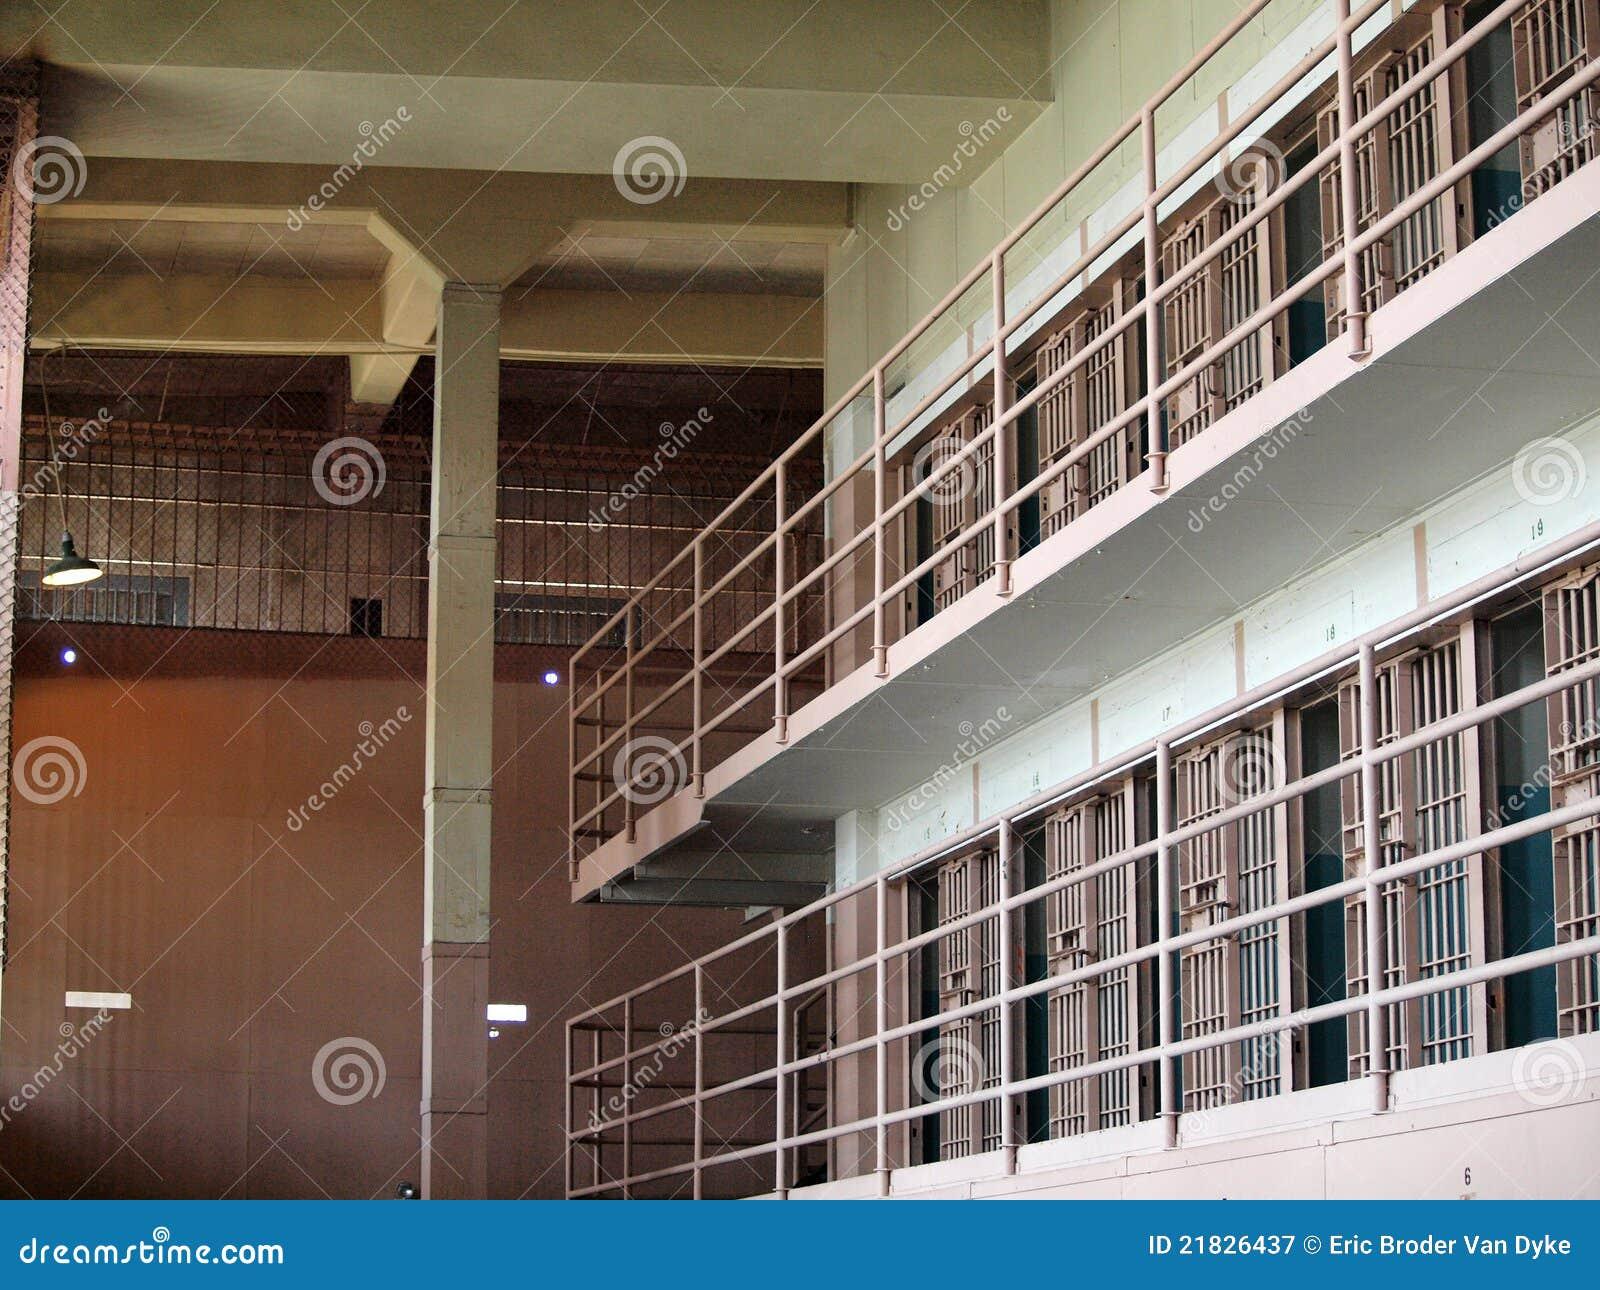 Rows of prison cells inside alcatraz prison stock image for Binnen interieur